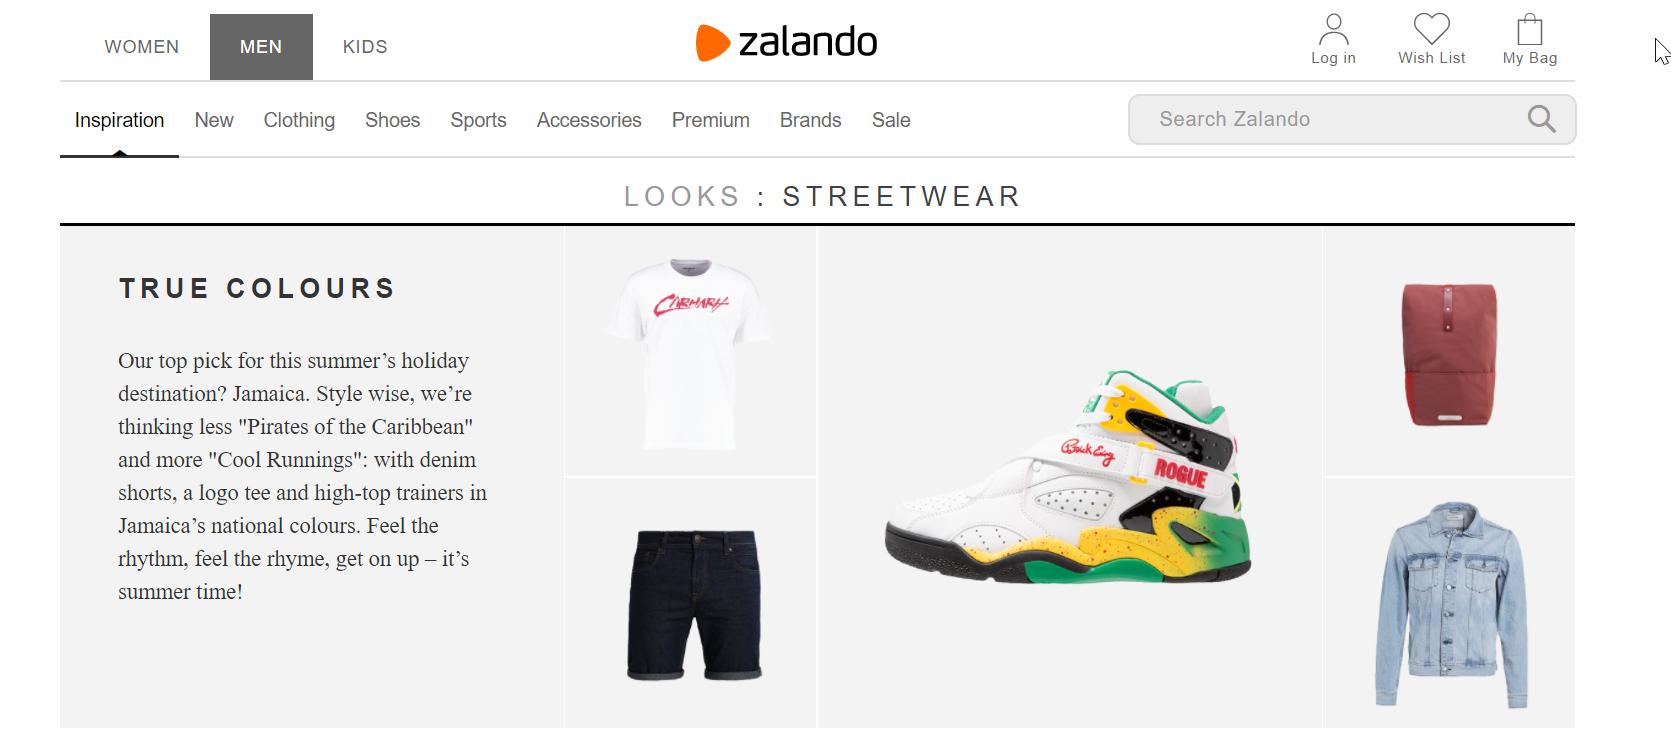 Cross-selling idea for fashion ecommerce